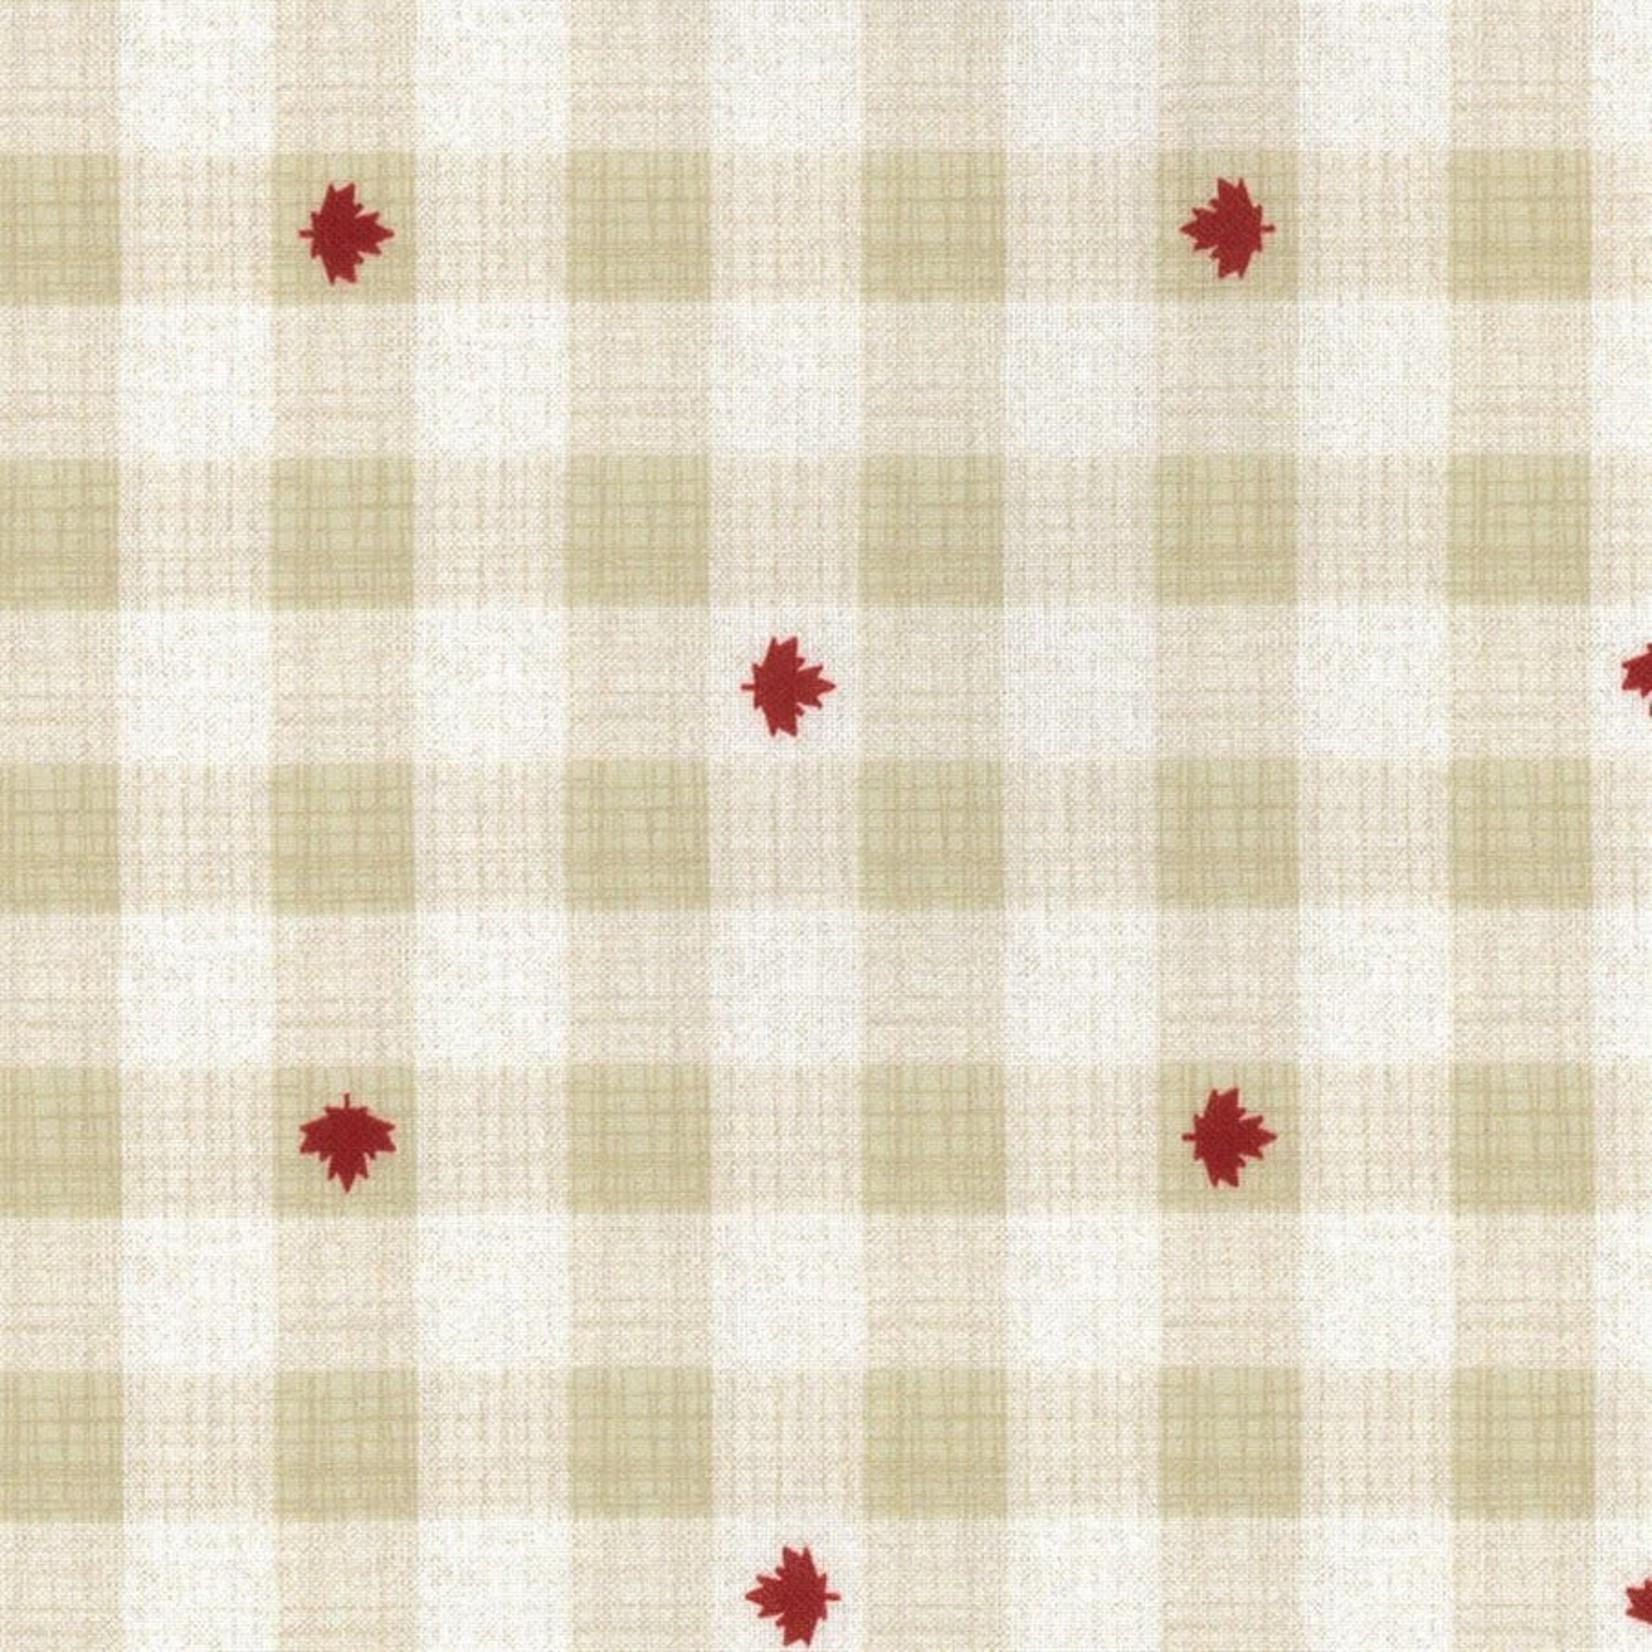 Kate & Birdie Paper Co. True North 2, Buffalo Plaid, Linen 513215-14 per cm or $20/m